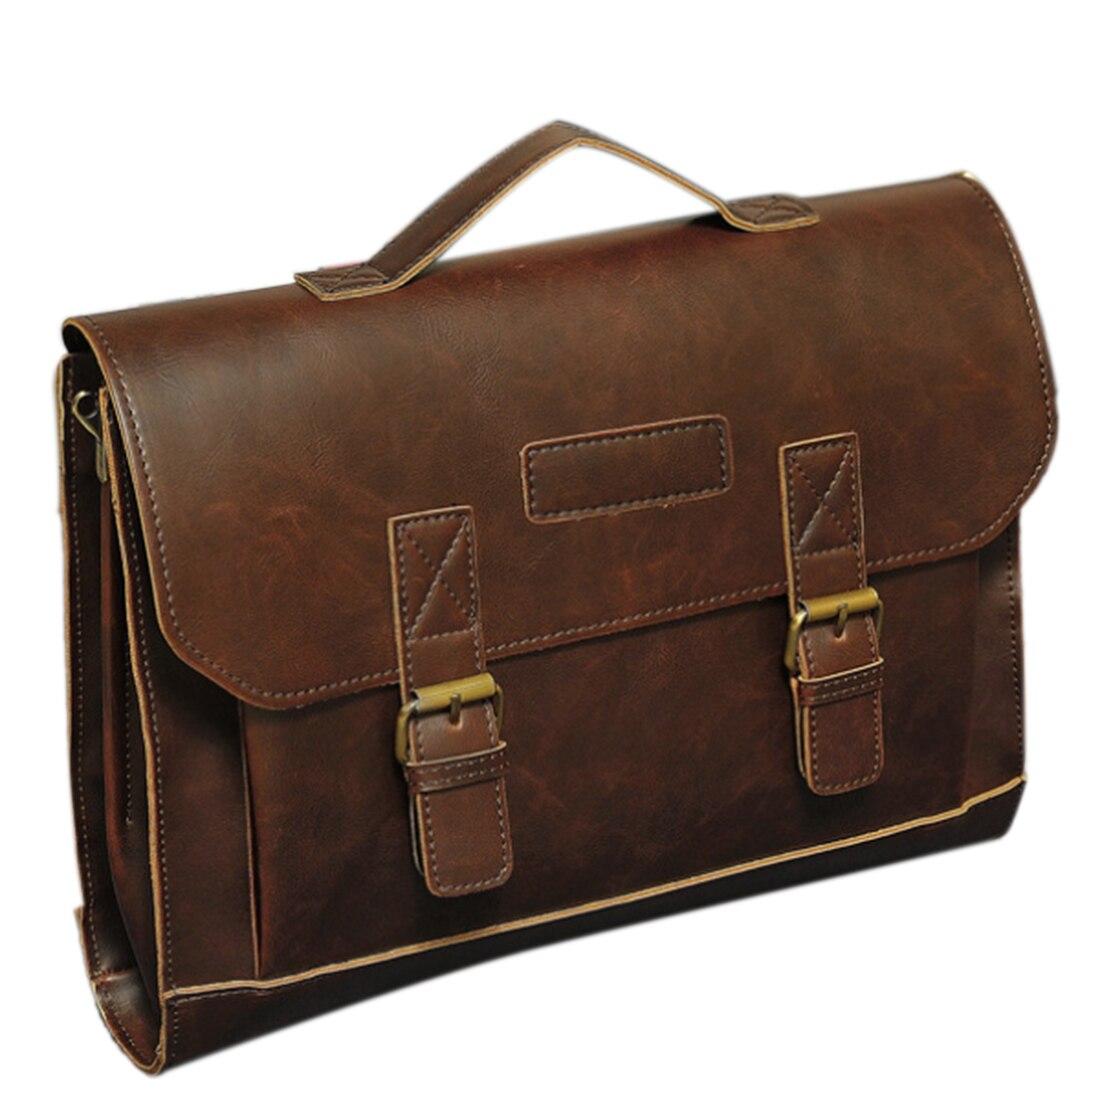 цены Brand New Men'S Briefcases Classic Style With PU Leather Single Shoulder Bag Business Portfolio Messenger Bag For Men Male Hot